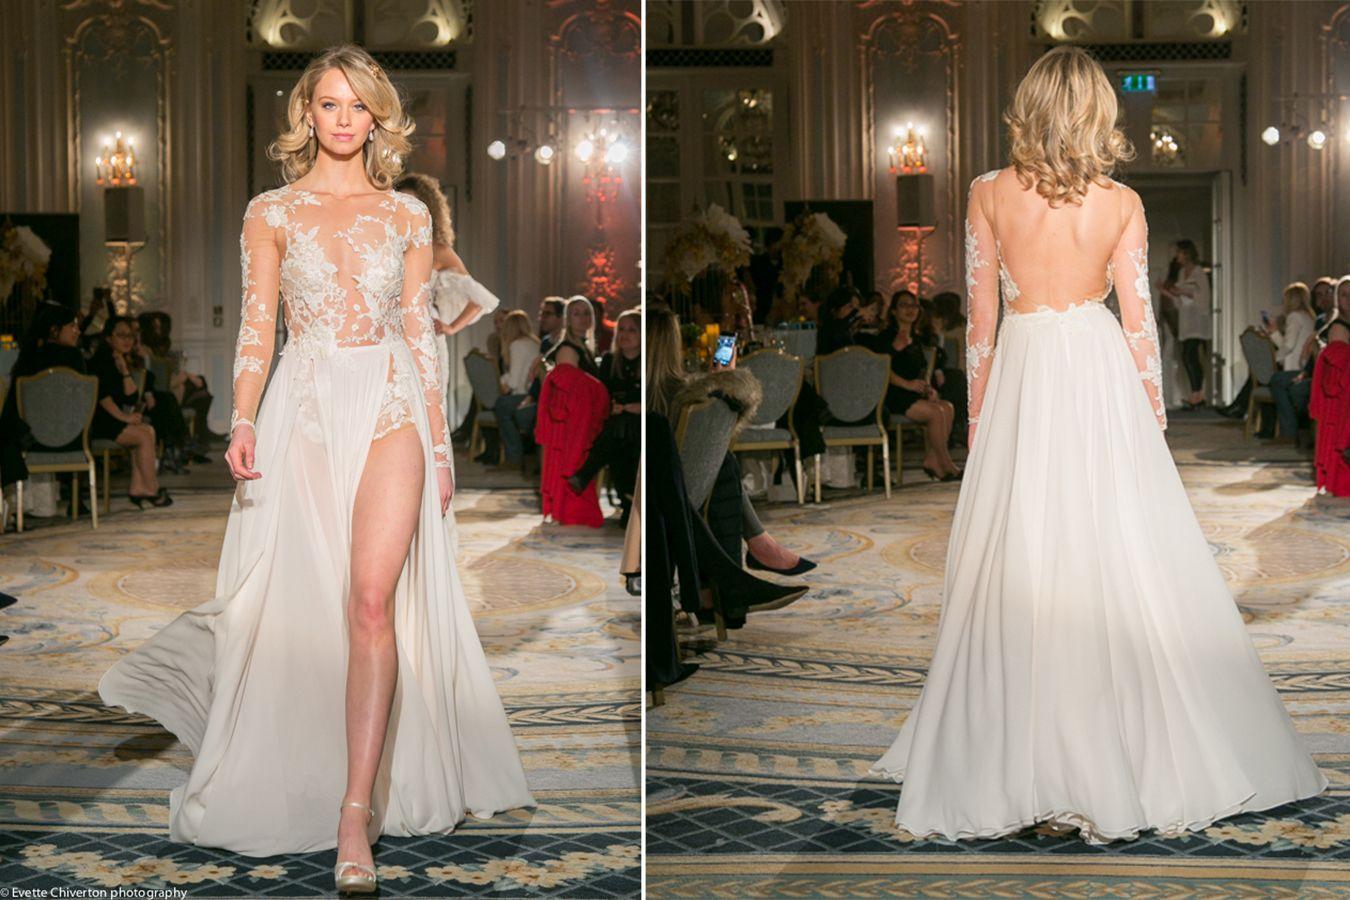 Hayley paige dori wedding dress  Elegant Berta bridal gown at the London savoy with the wedding club